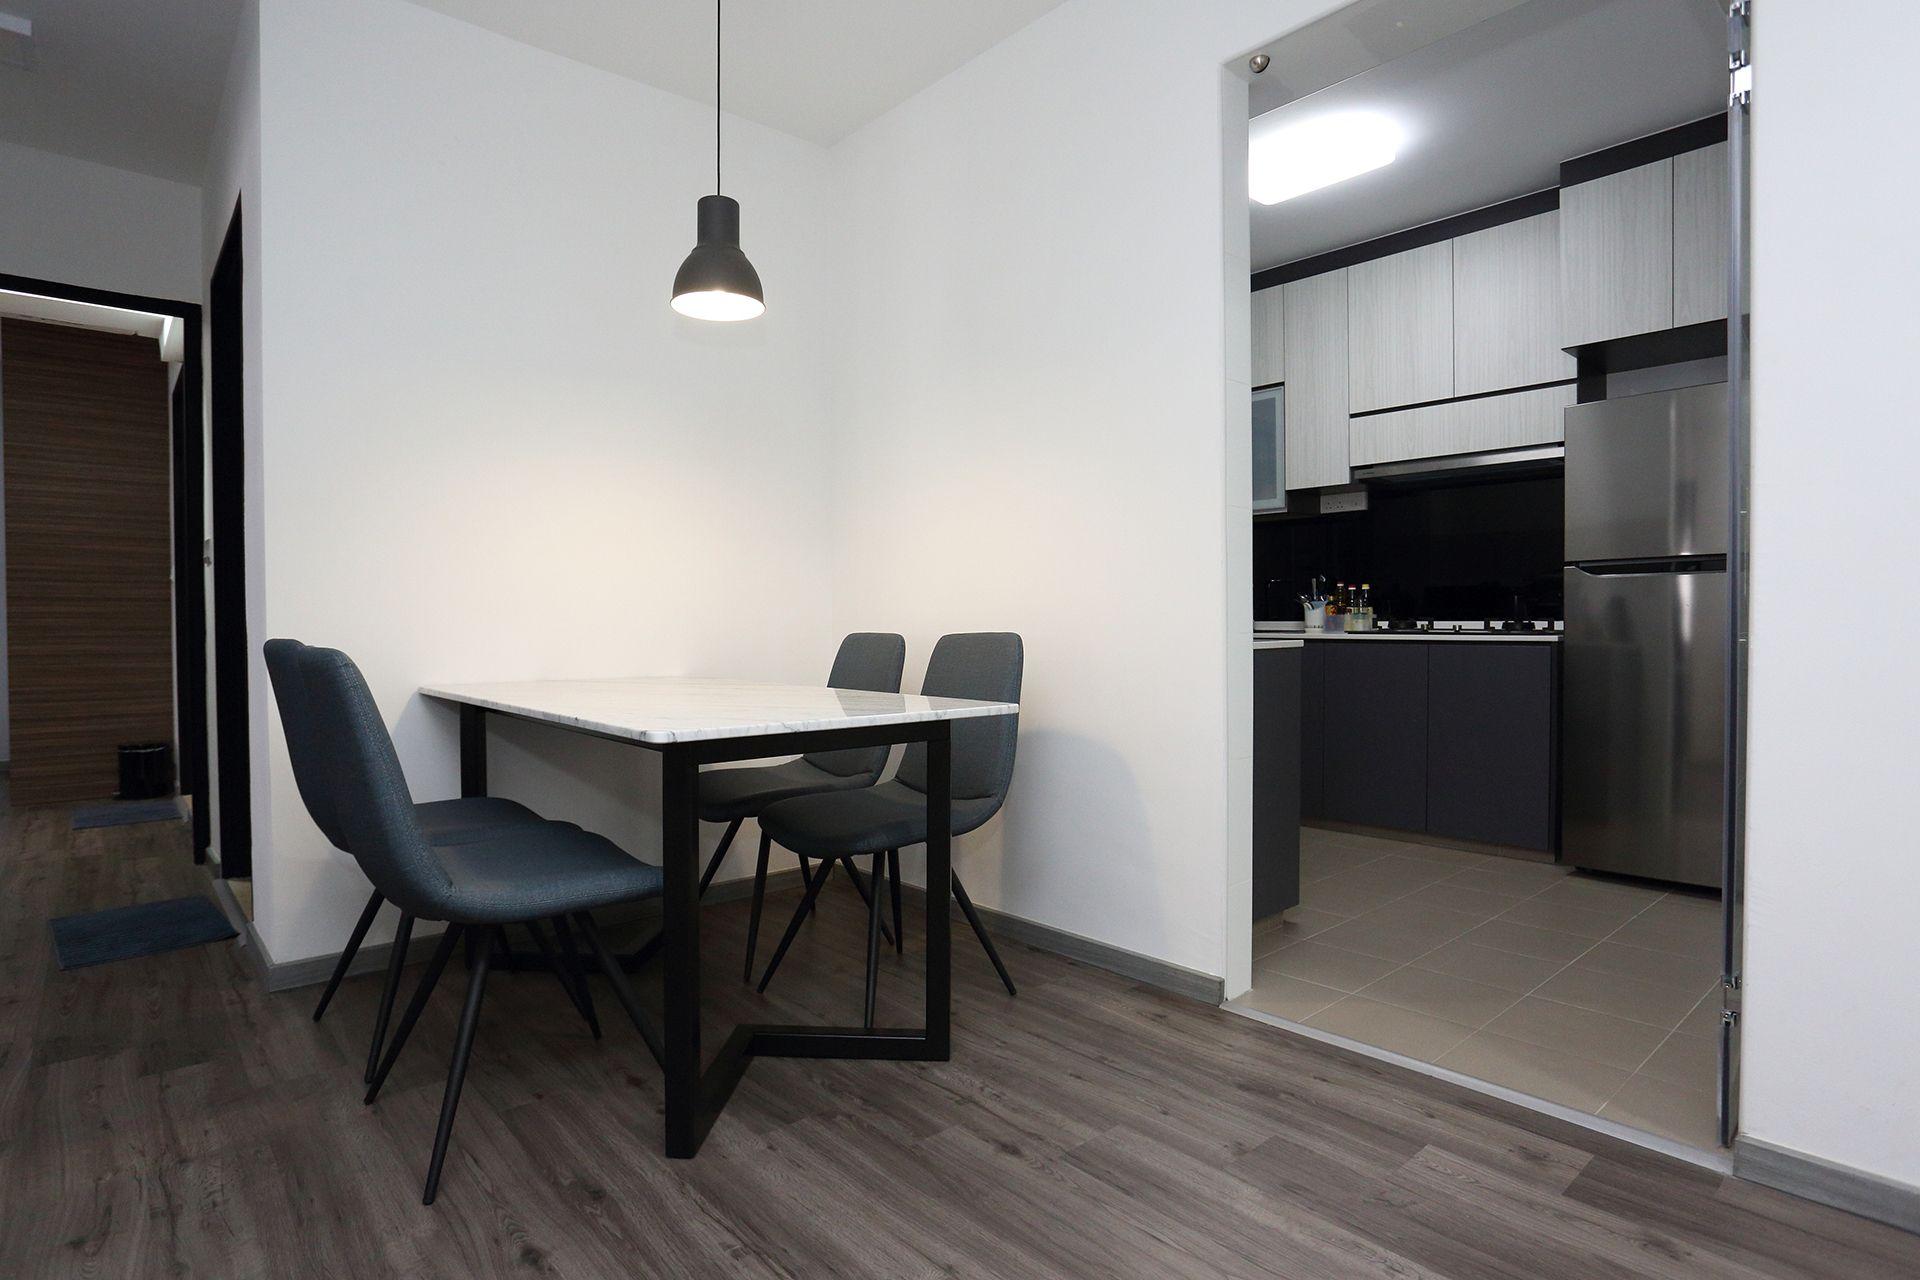 Minimalist Home Interior Design Singapore Dining Area View